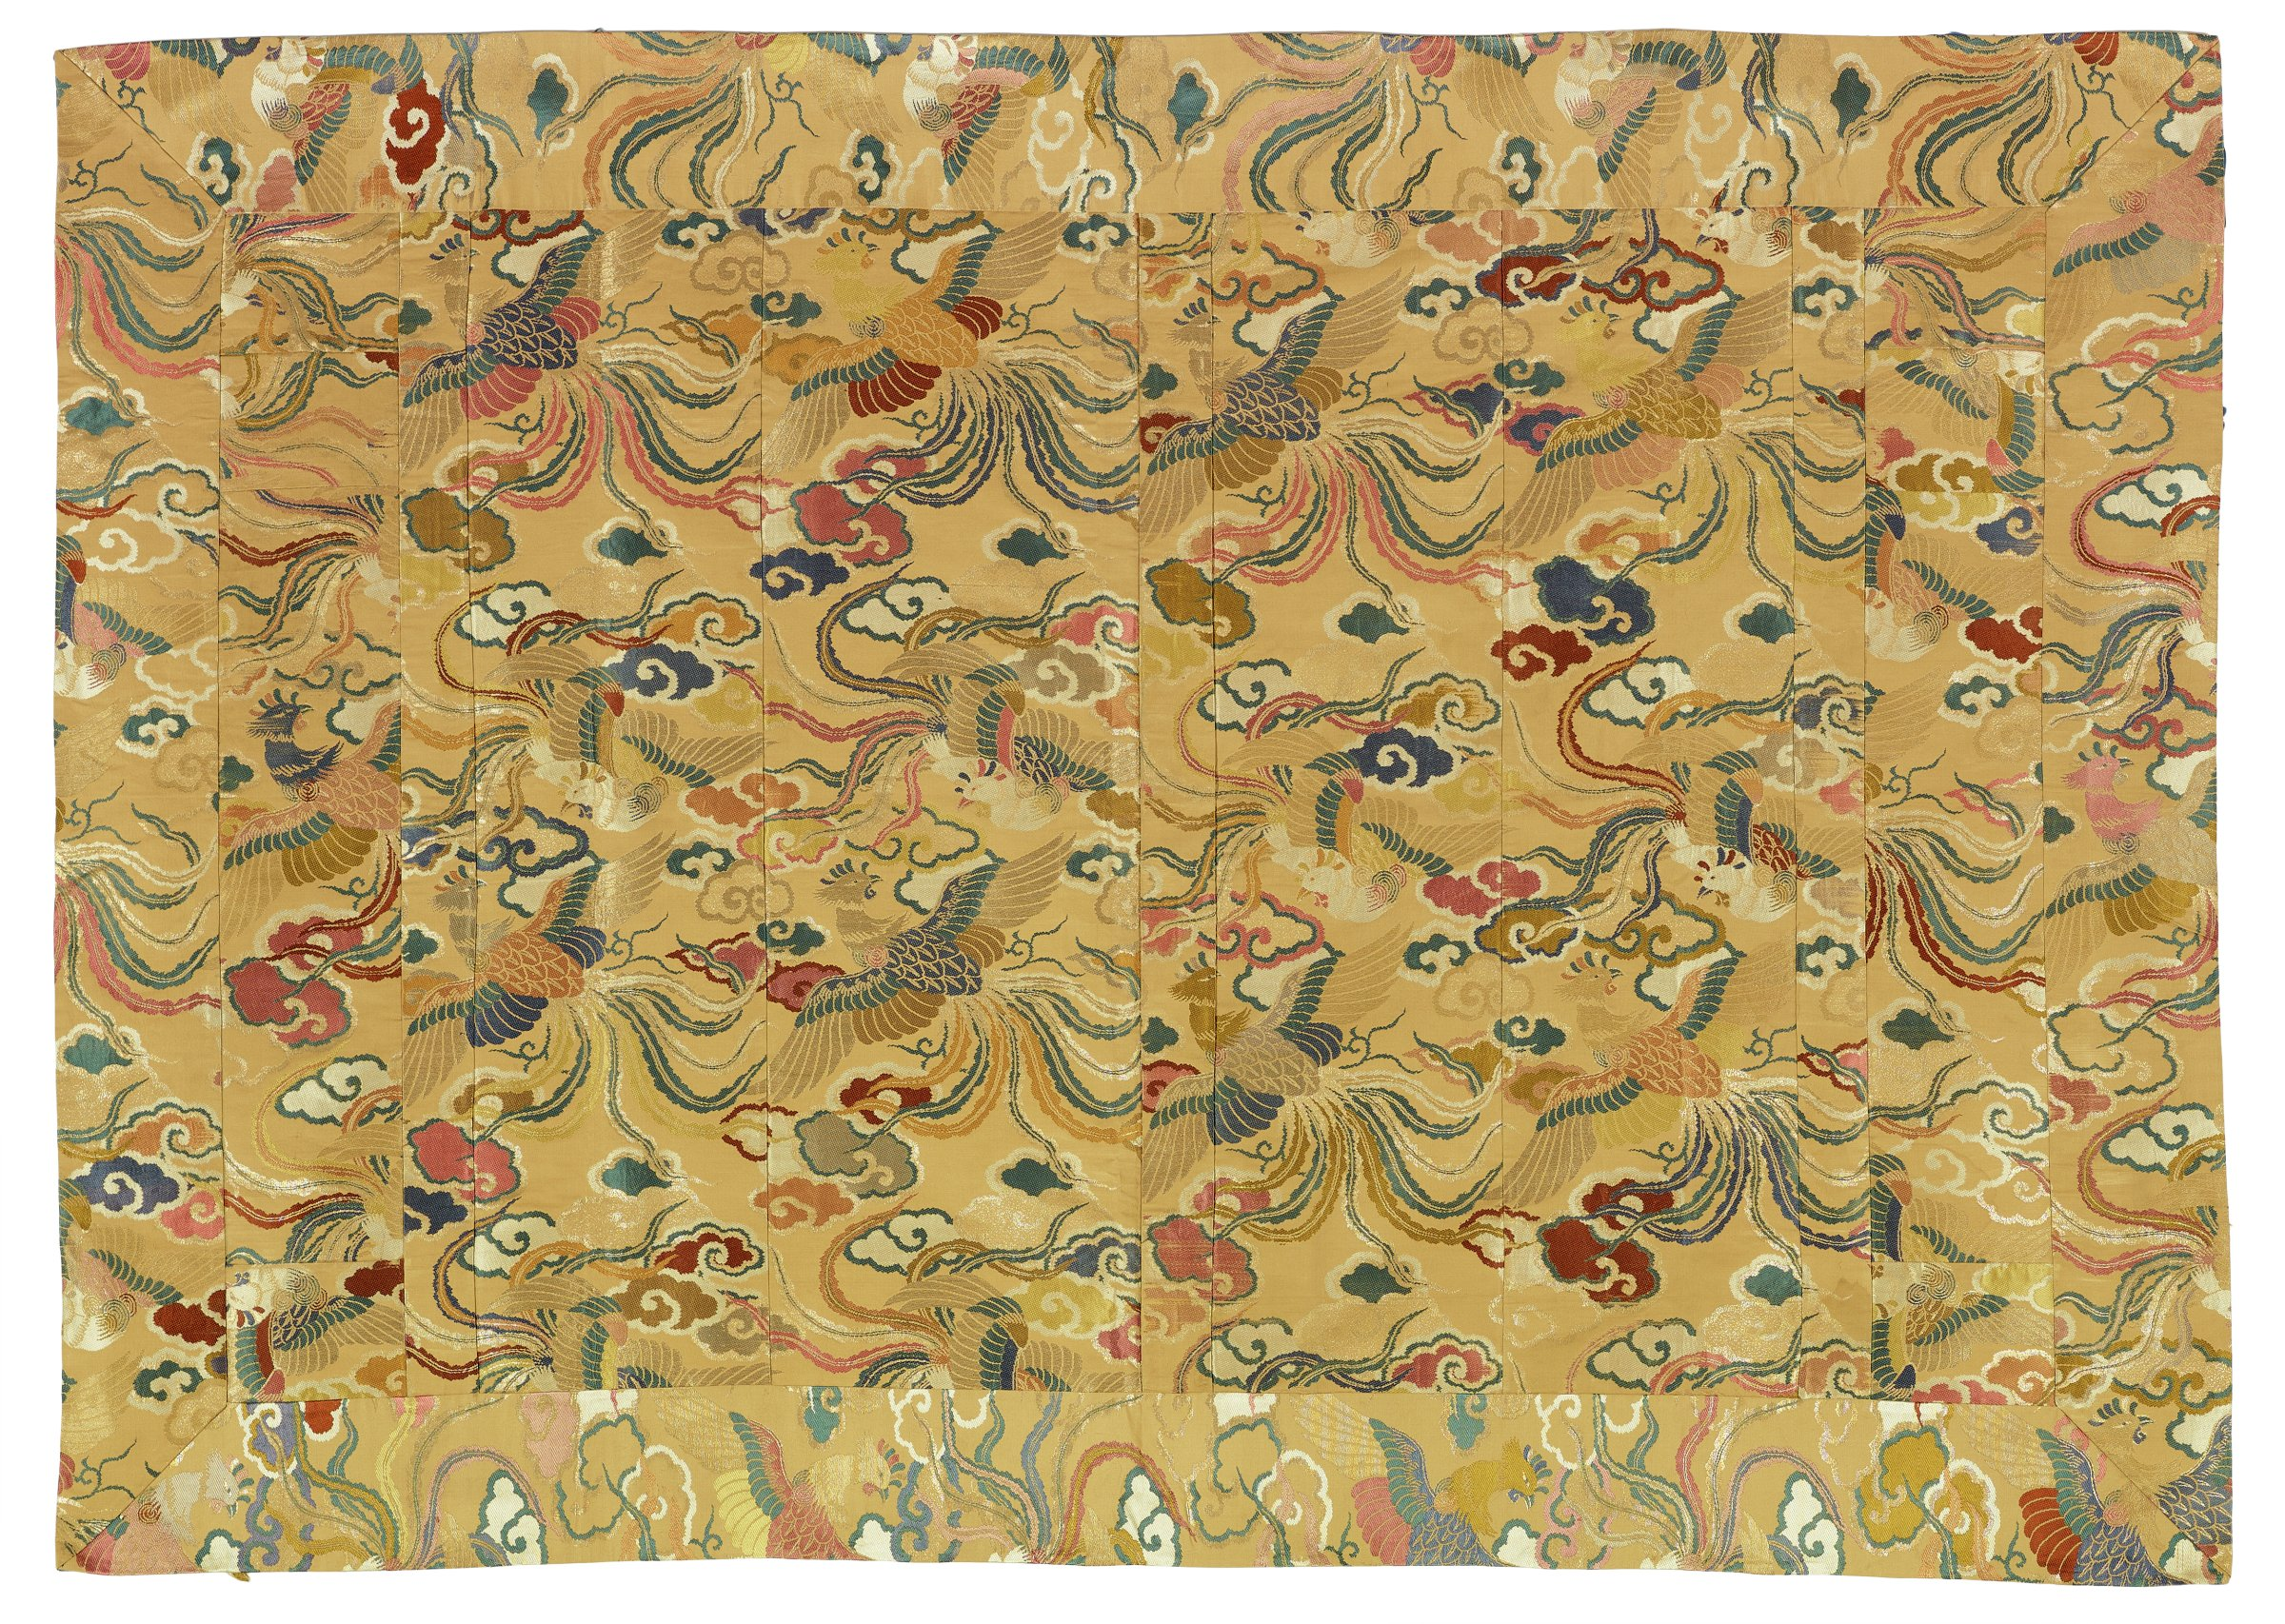 Priest's Robe (Kesa), Japan, silk and metallic thread